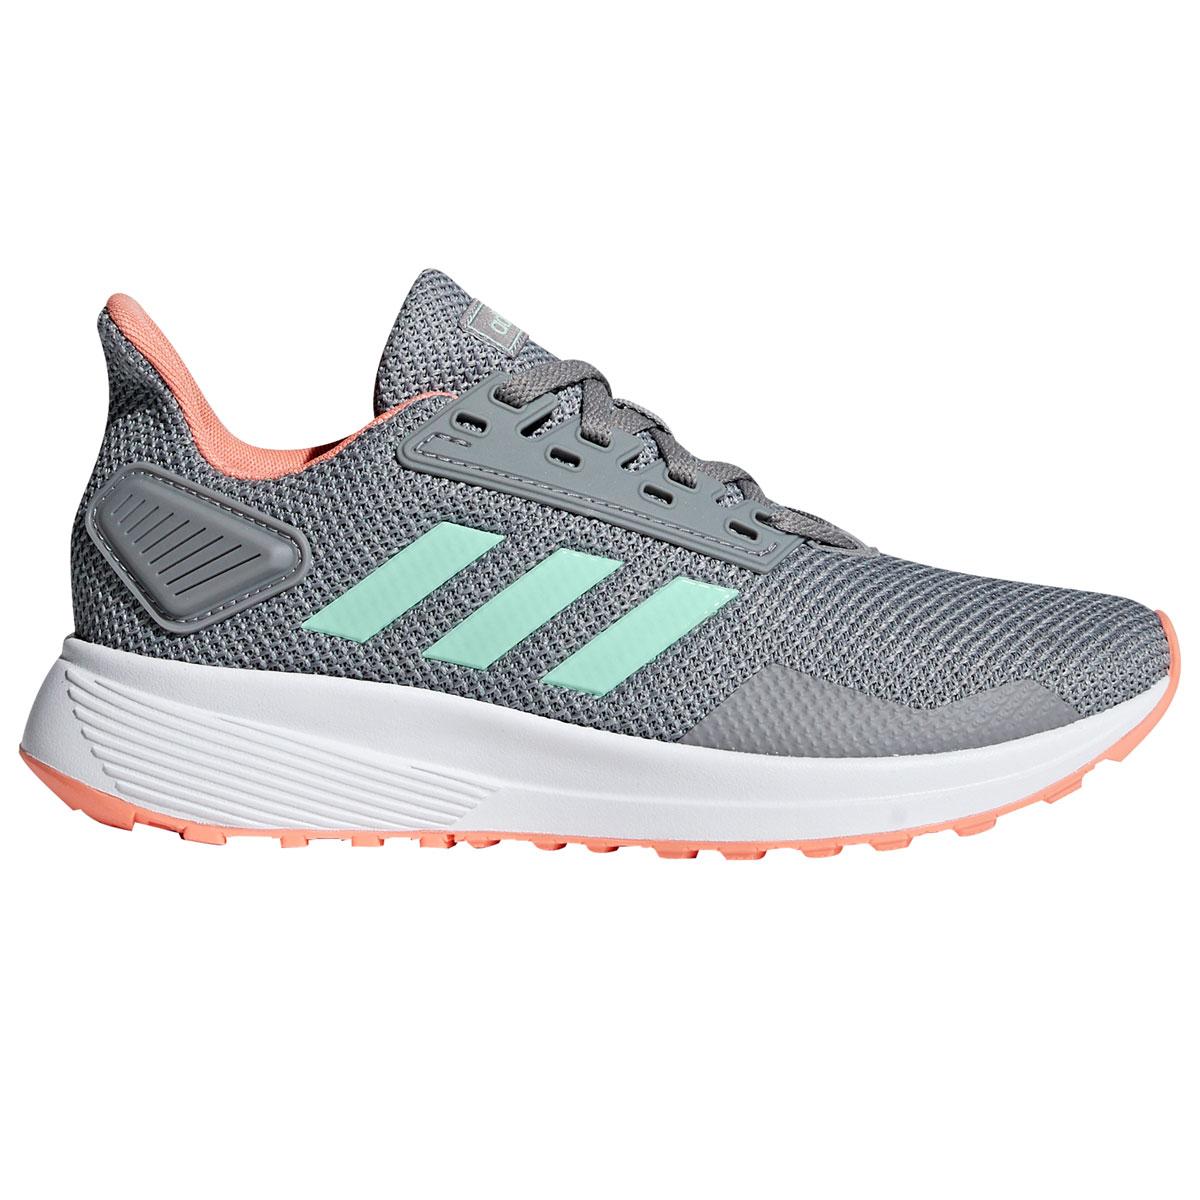 Adidas Little Girls' Duramo 9 Sneakers - Black, 5.5